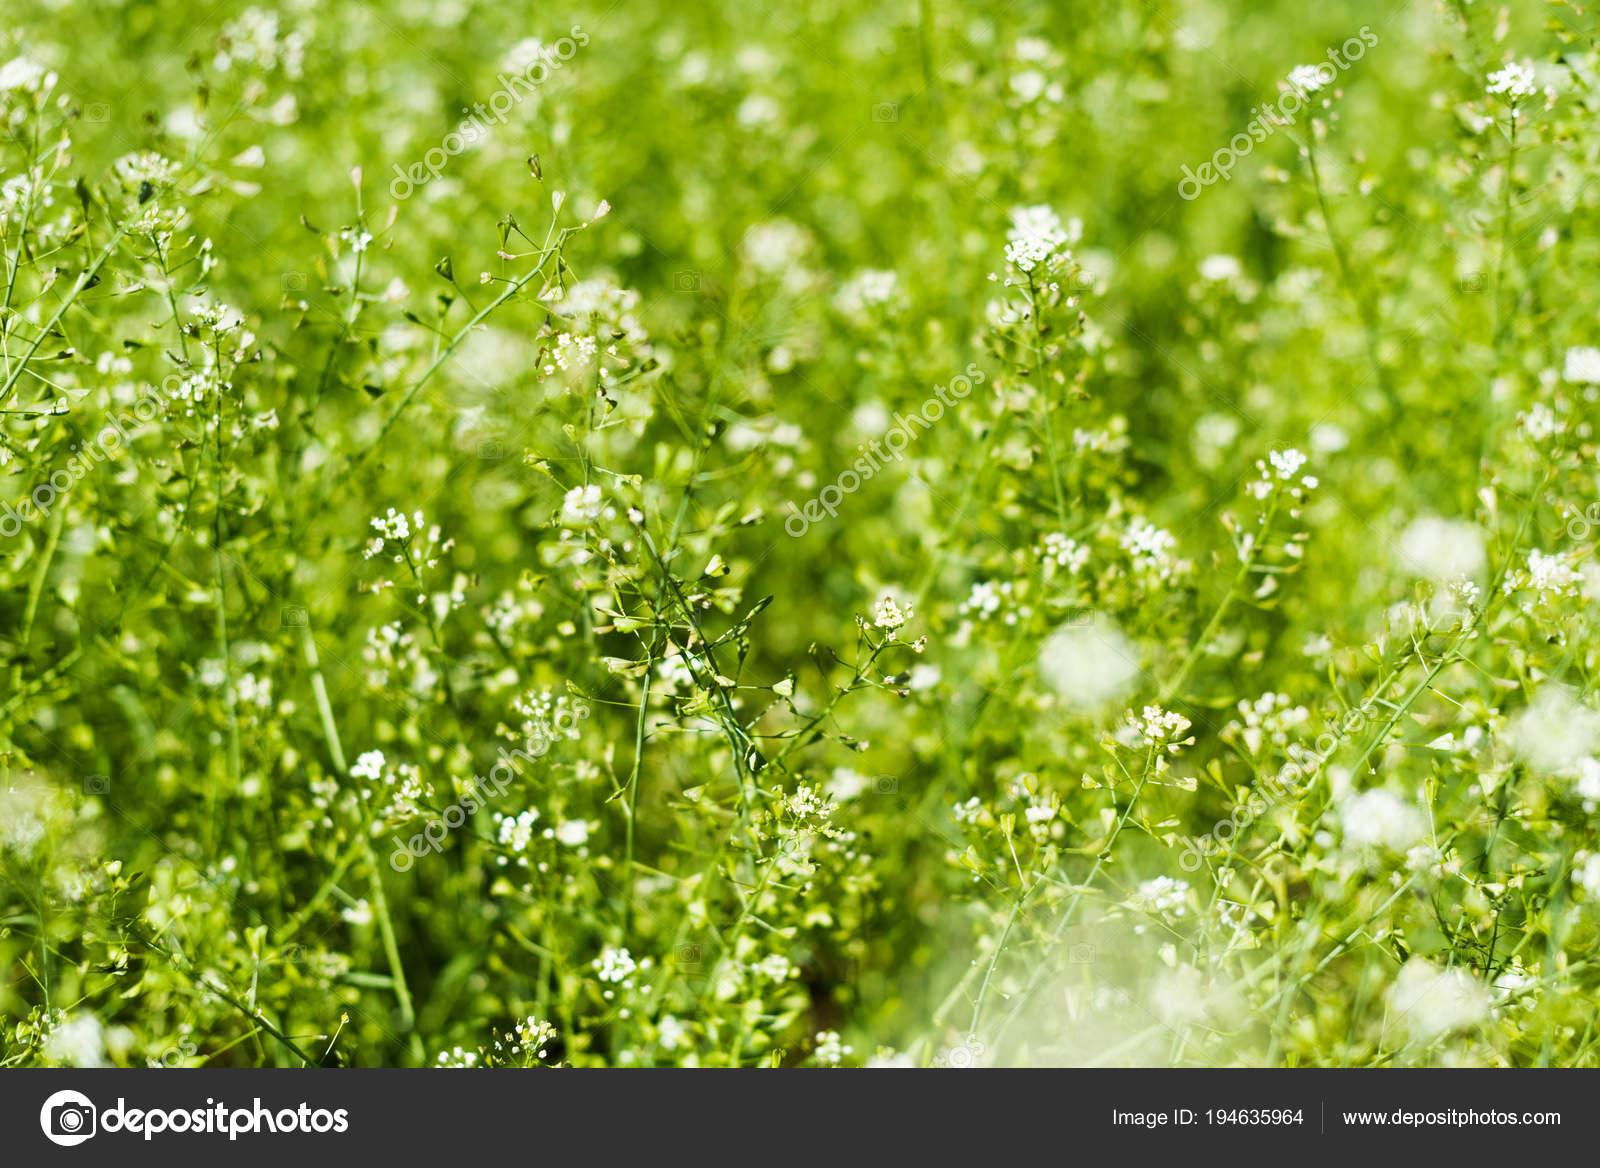 Wild White Flowers Summer Lawn Stock Photo Y Boychenko 194635964